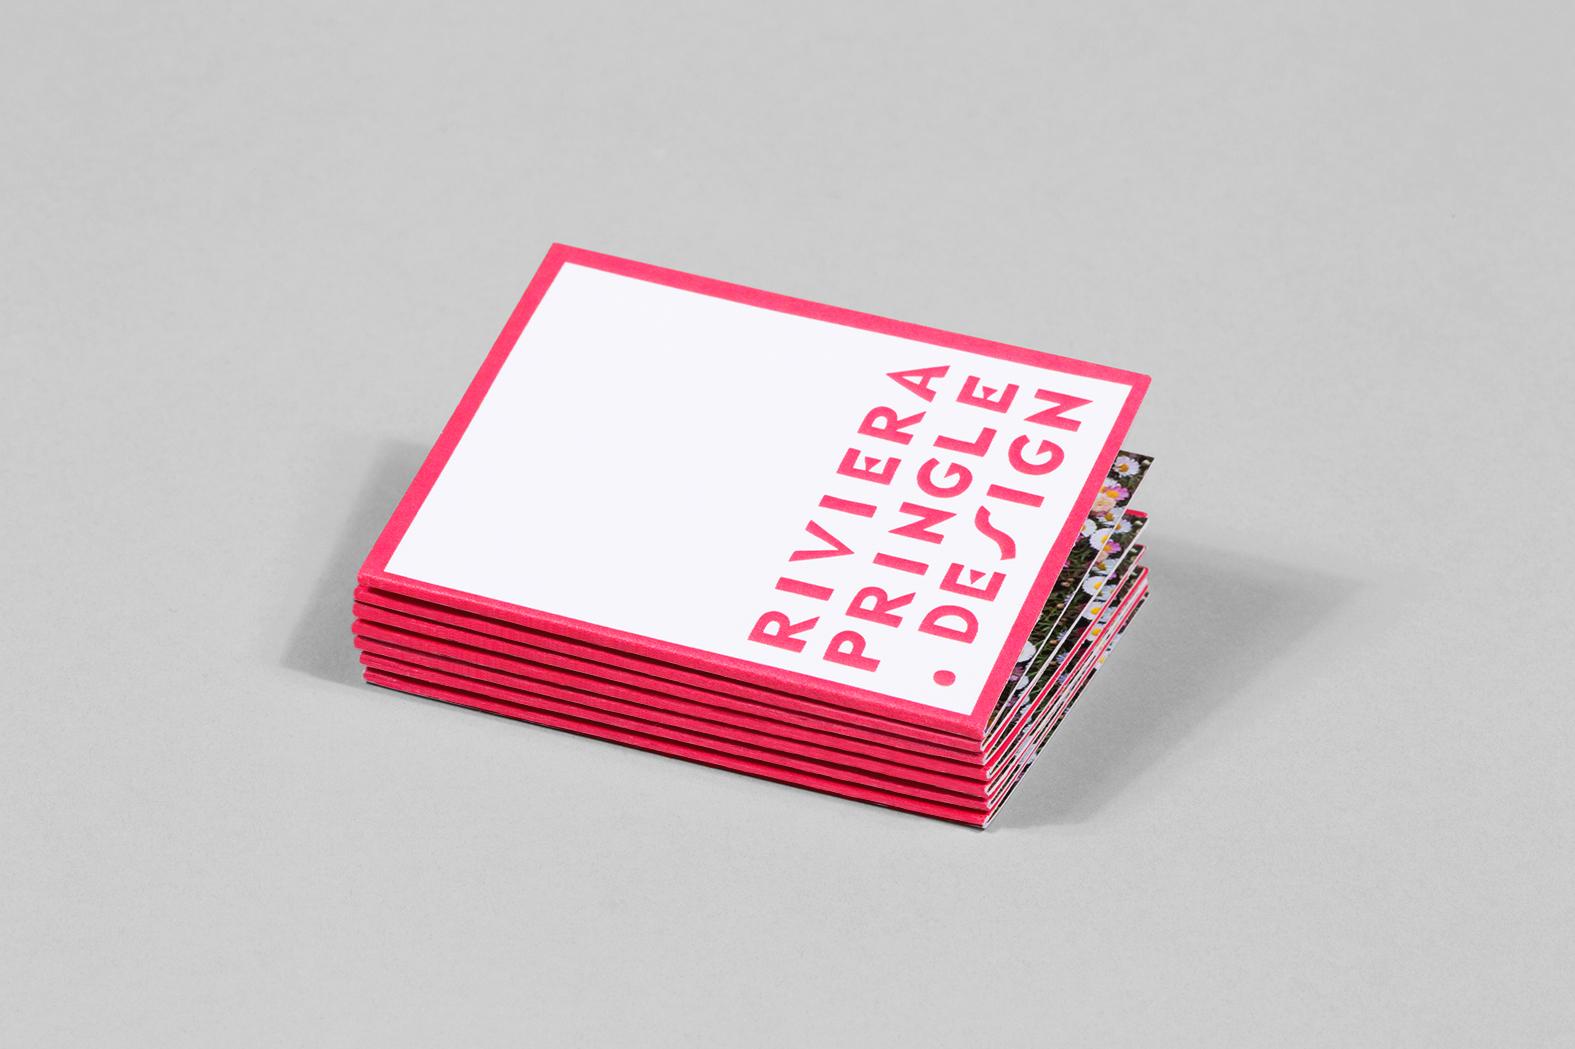 StudioEger_2018_RivieraPringle_WebReady2.jpg